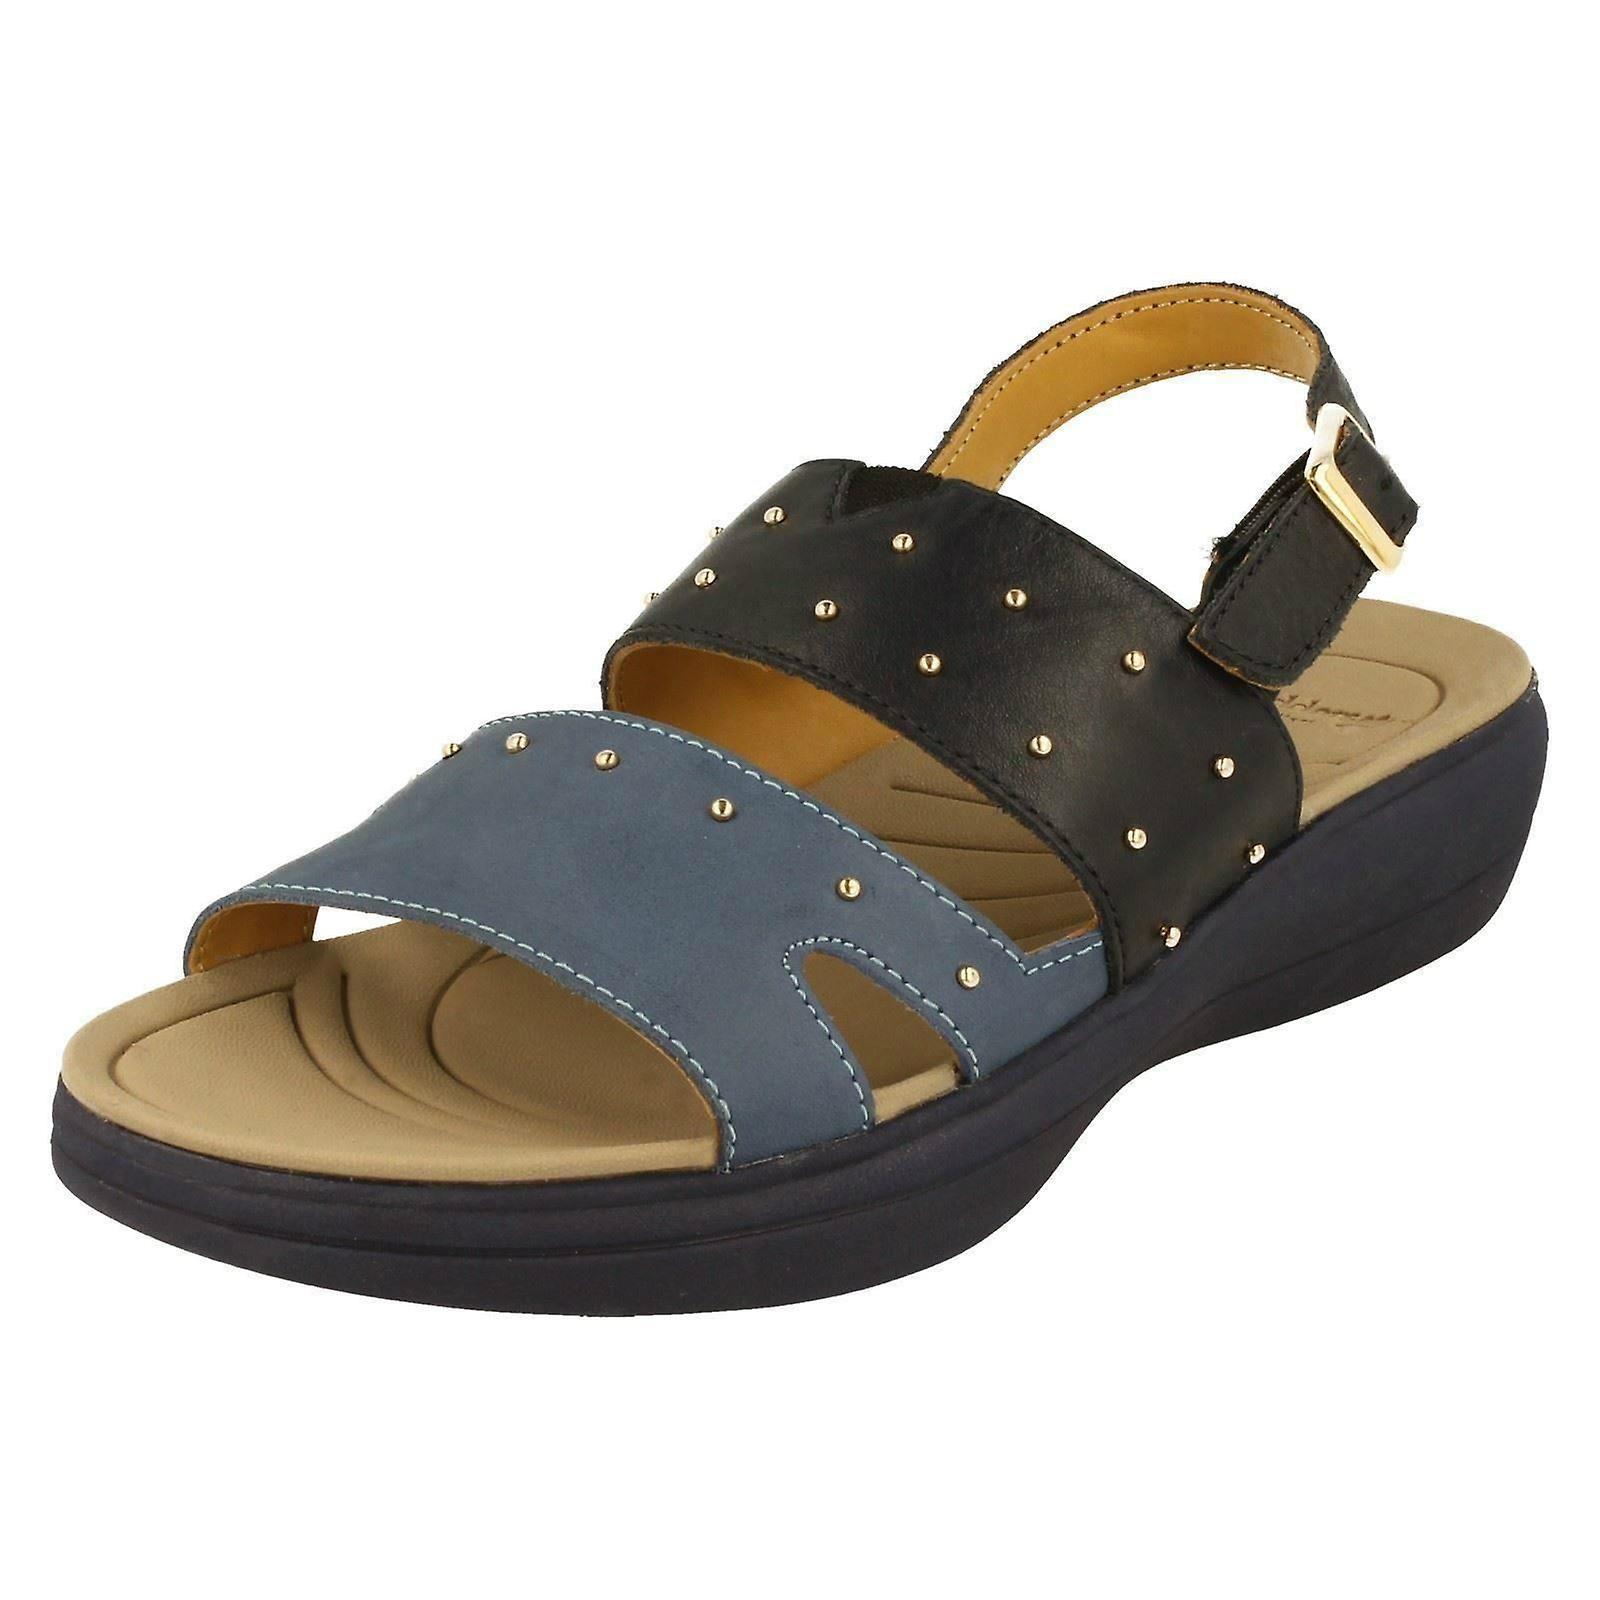 Panie Padders szerokim montażu sandały Cameo xUTSn